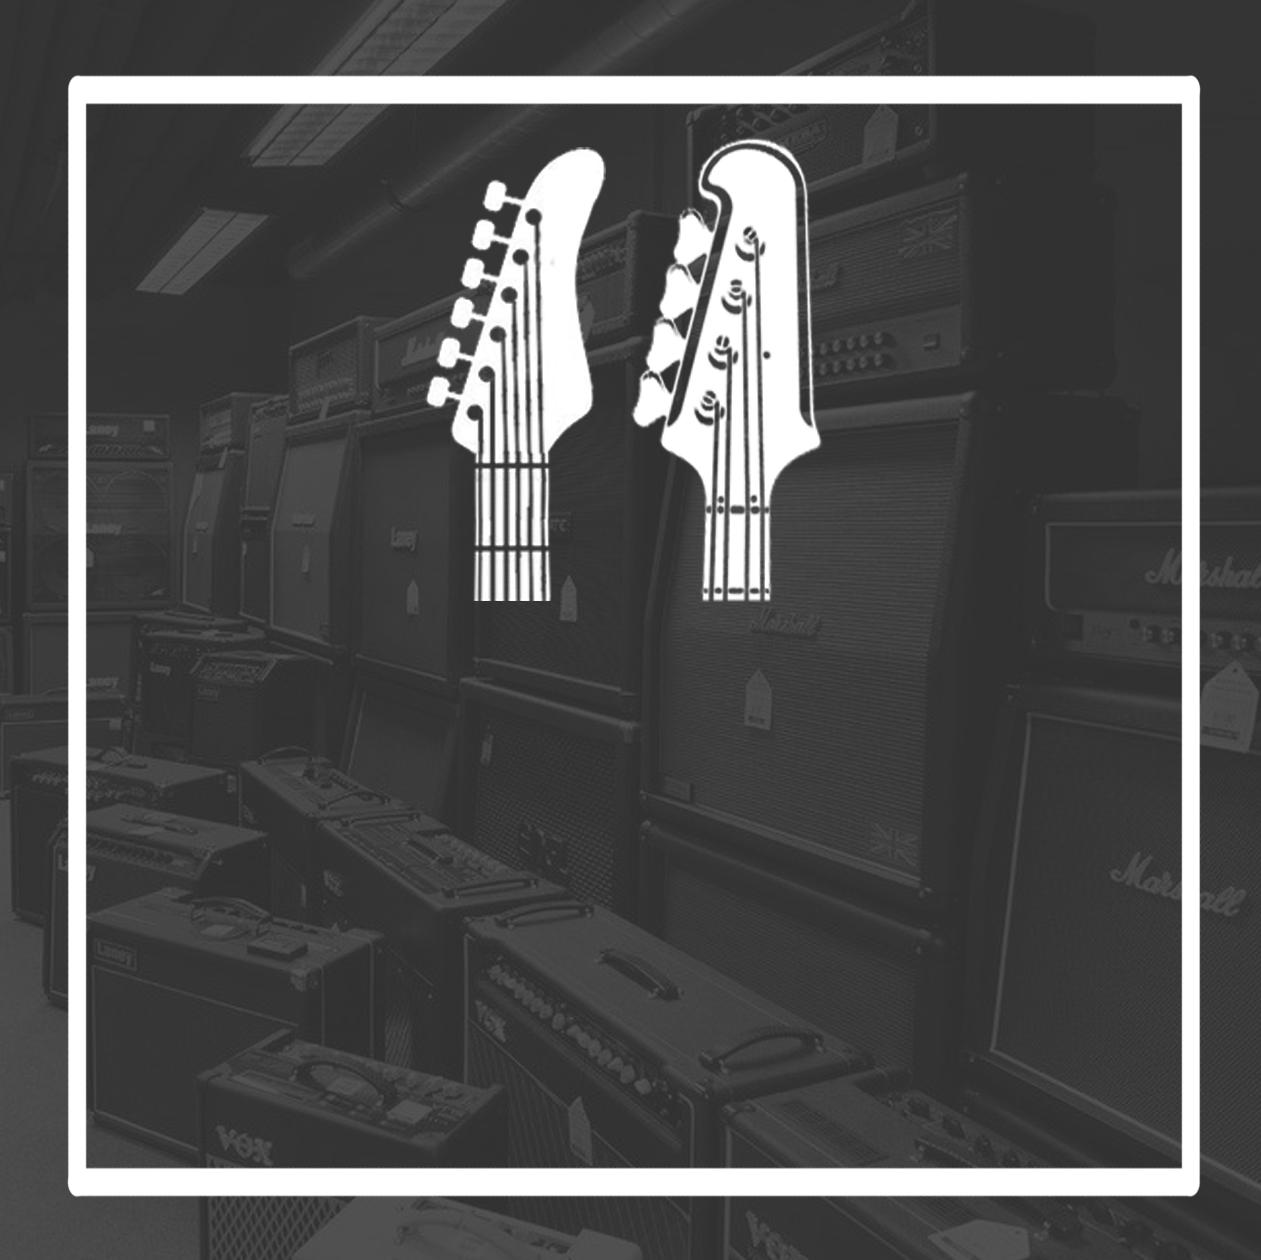 Музыкальные инструменты (Б/У)